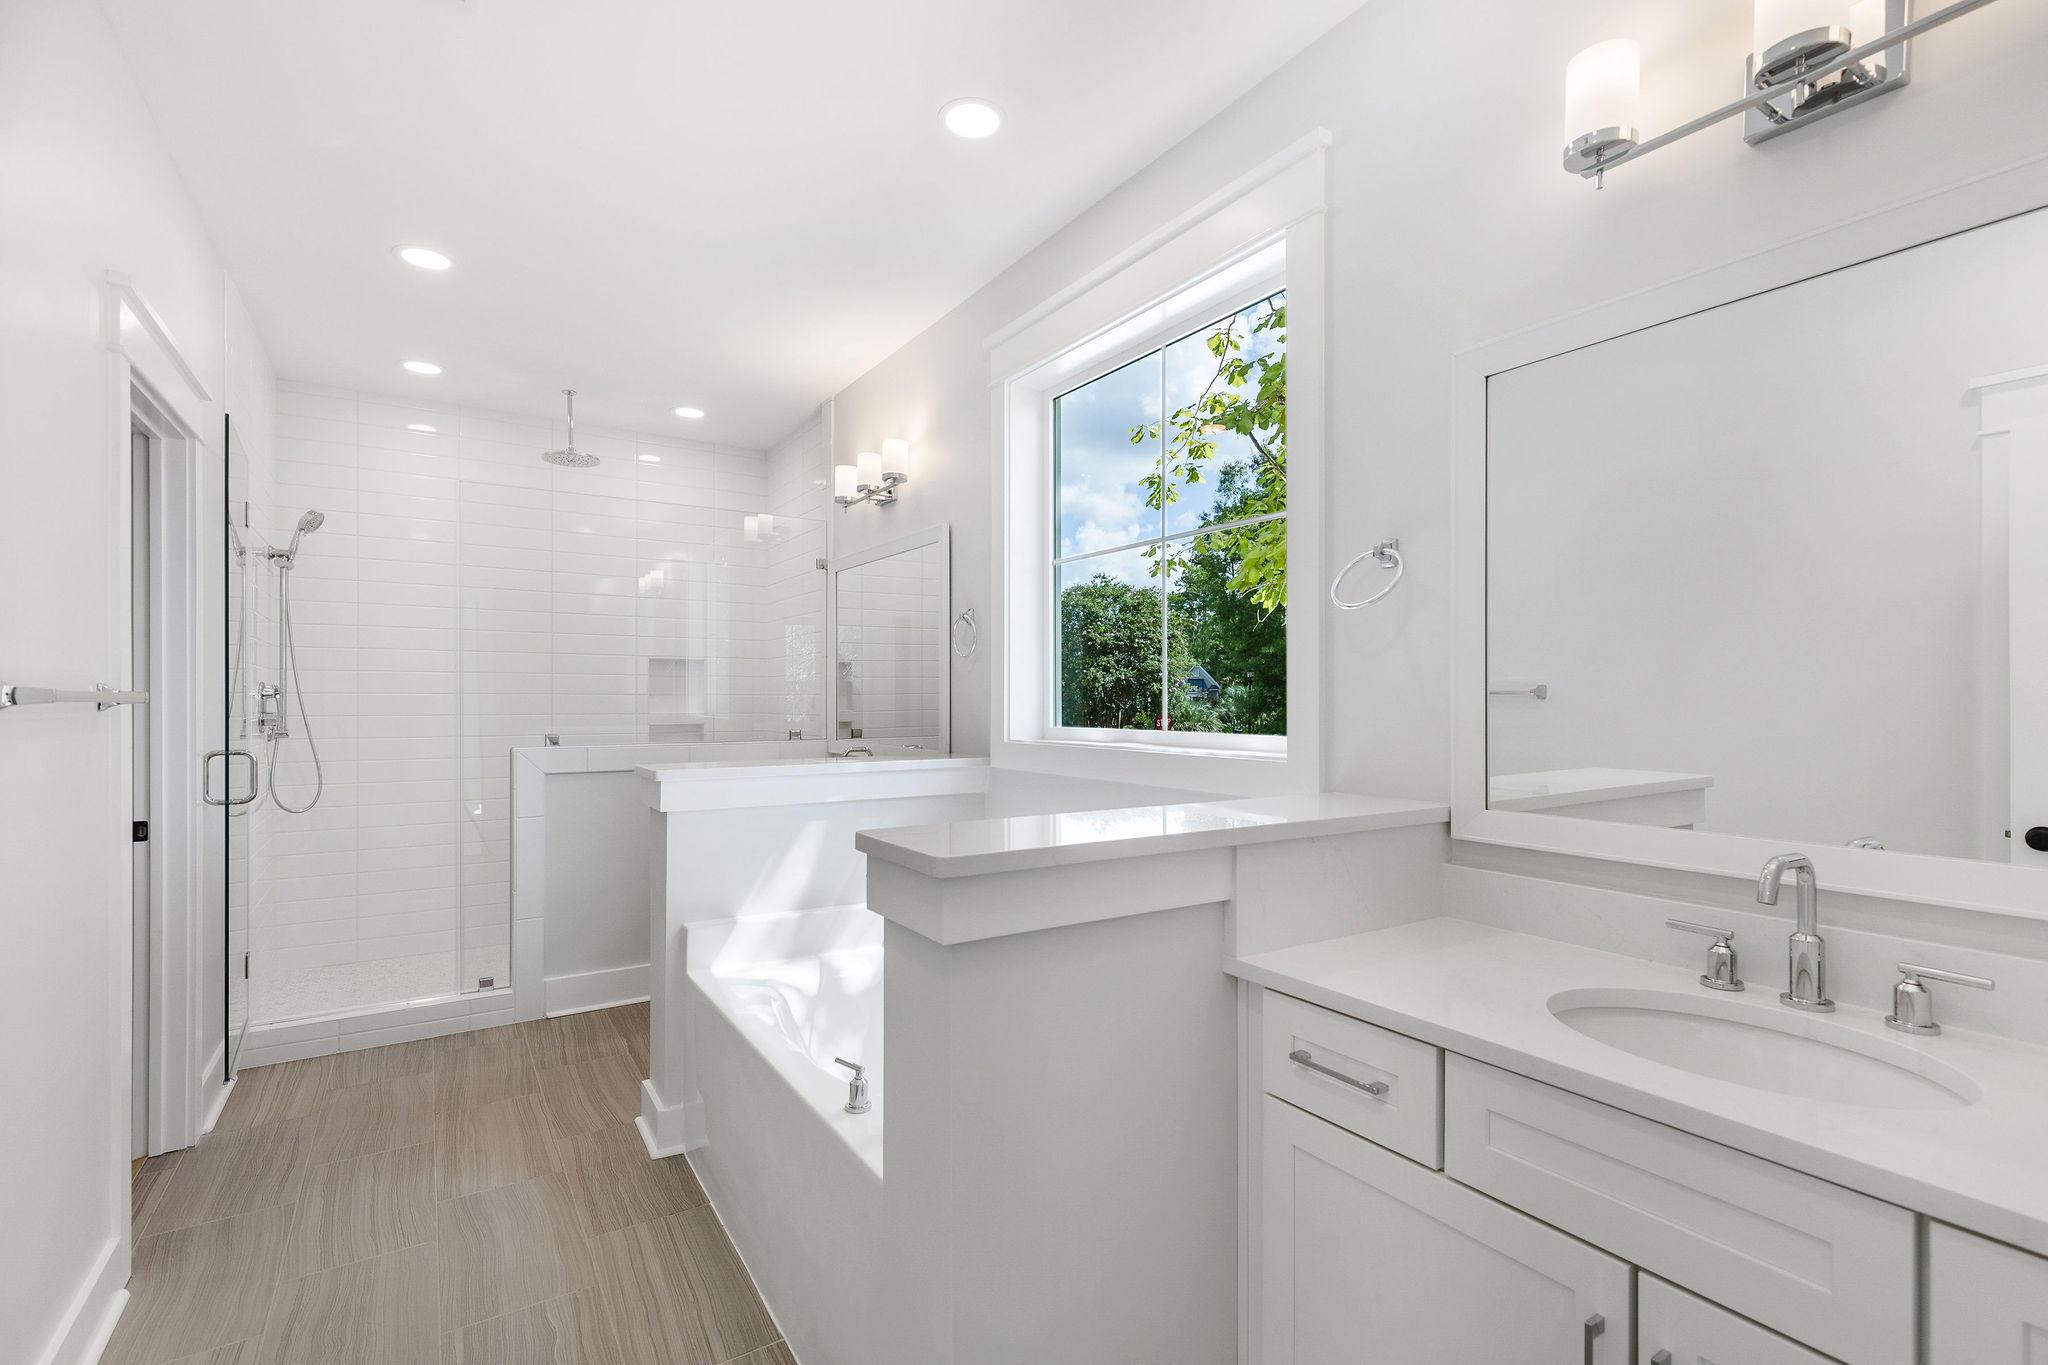 Park West Homes For Sale - 2291 Middlesex, Mount Pleasant, SC - 42